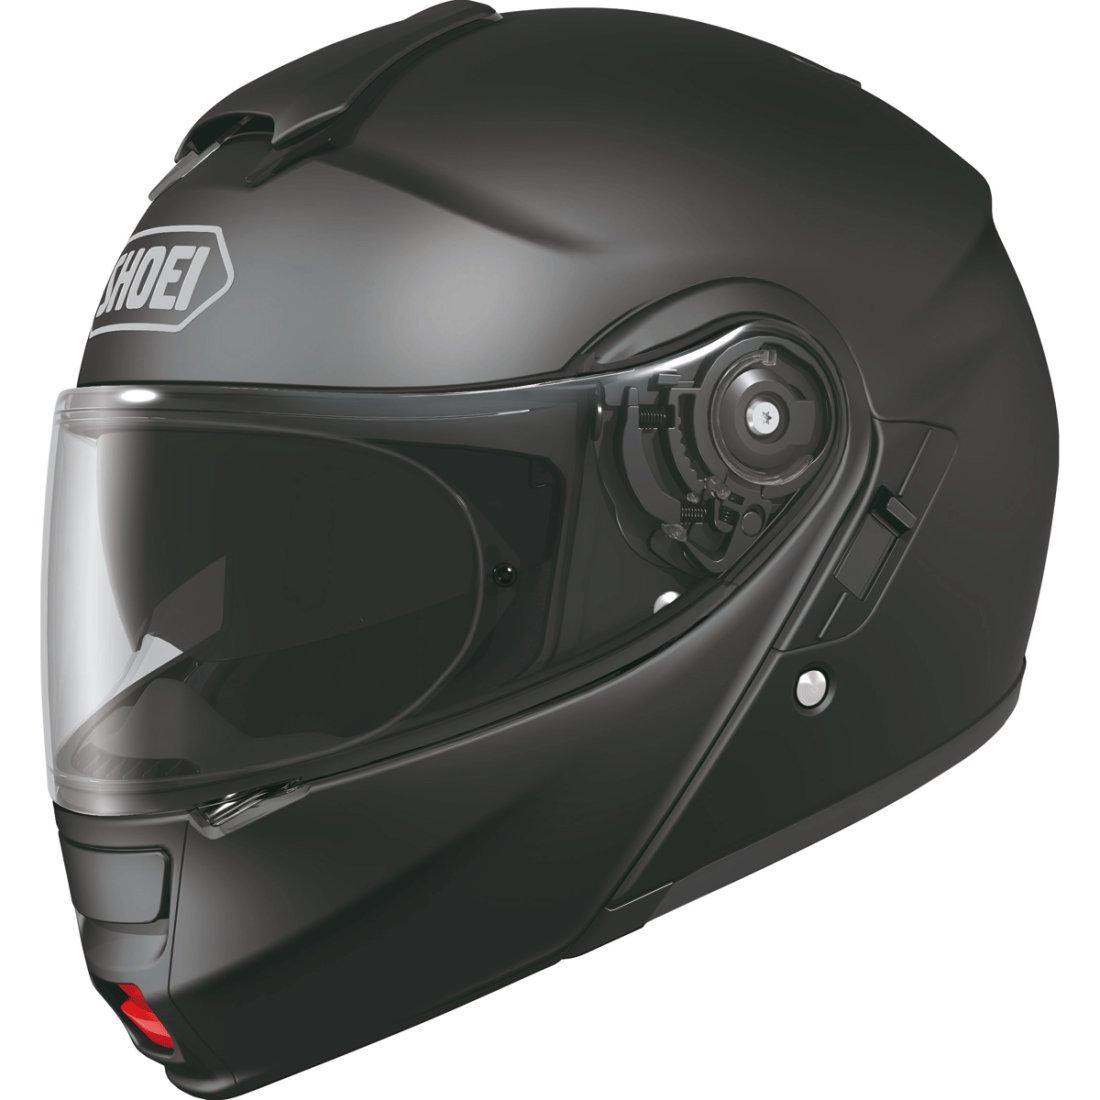 Chaquetas moto mujer baratas madrid